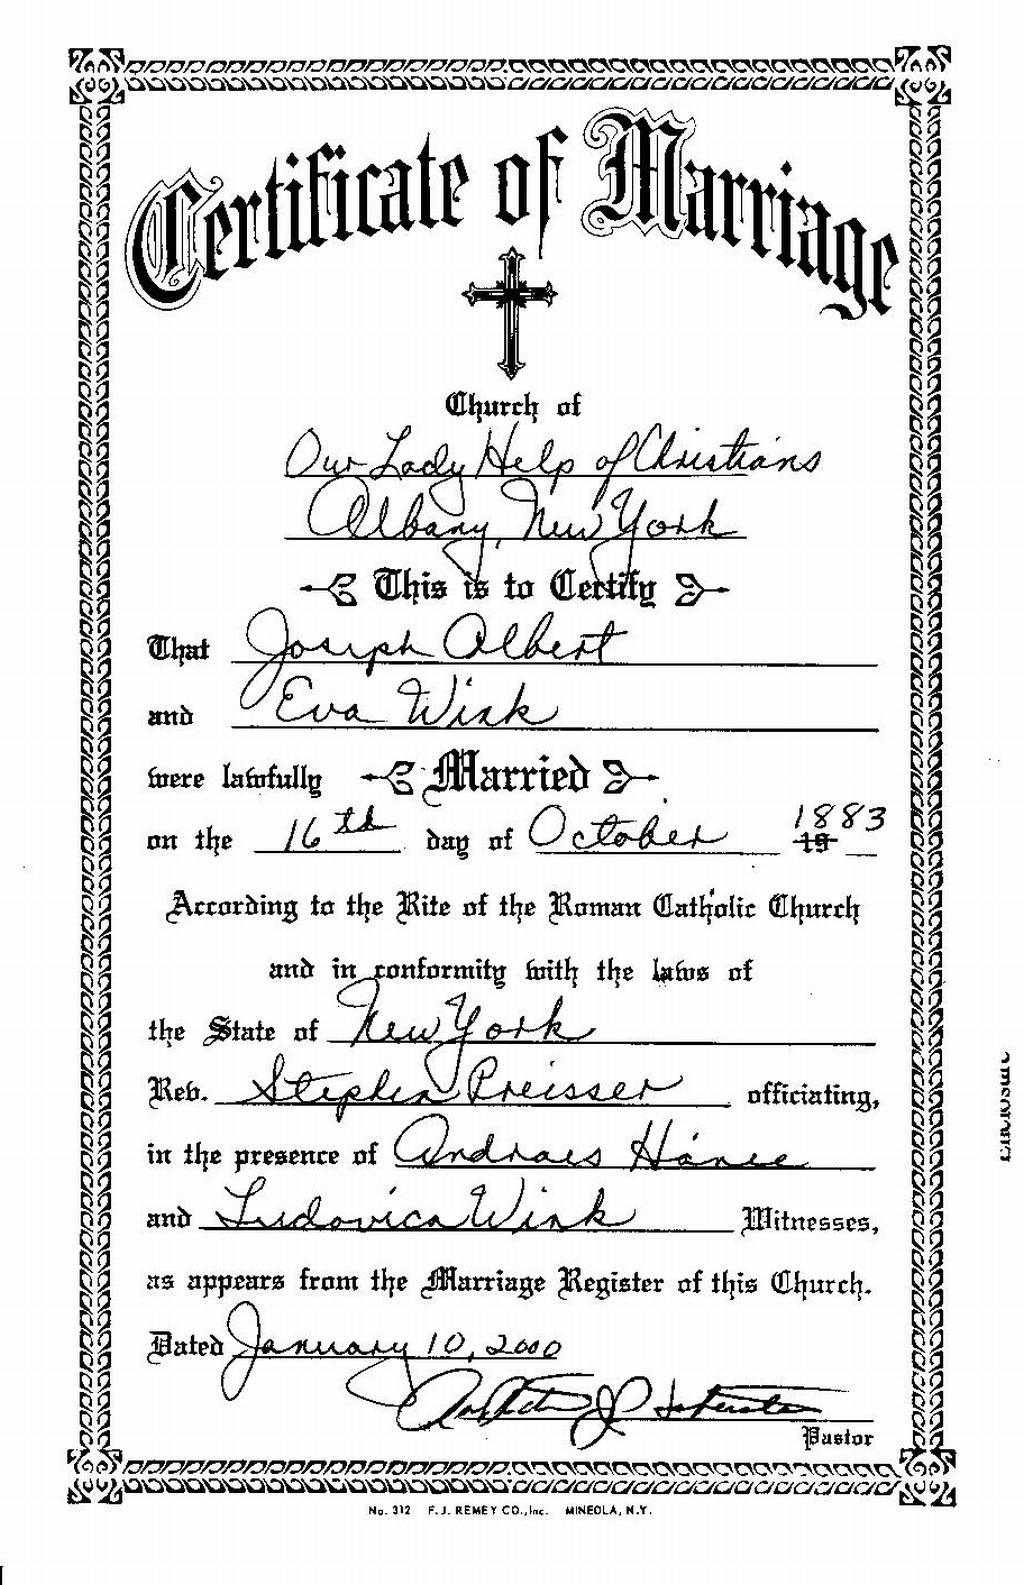 Jennings Genealogy - Joseph Albert and Eva Wink's marriage